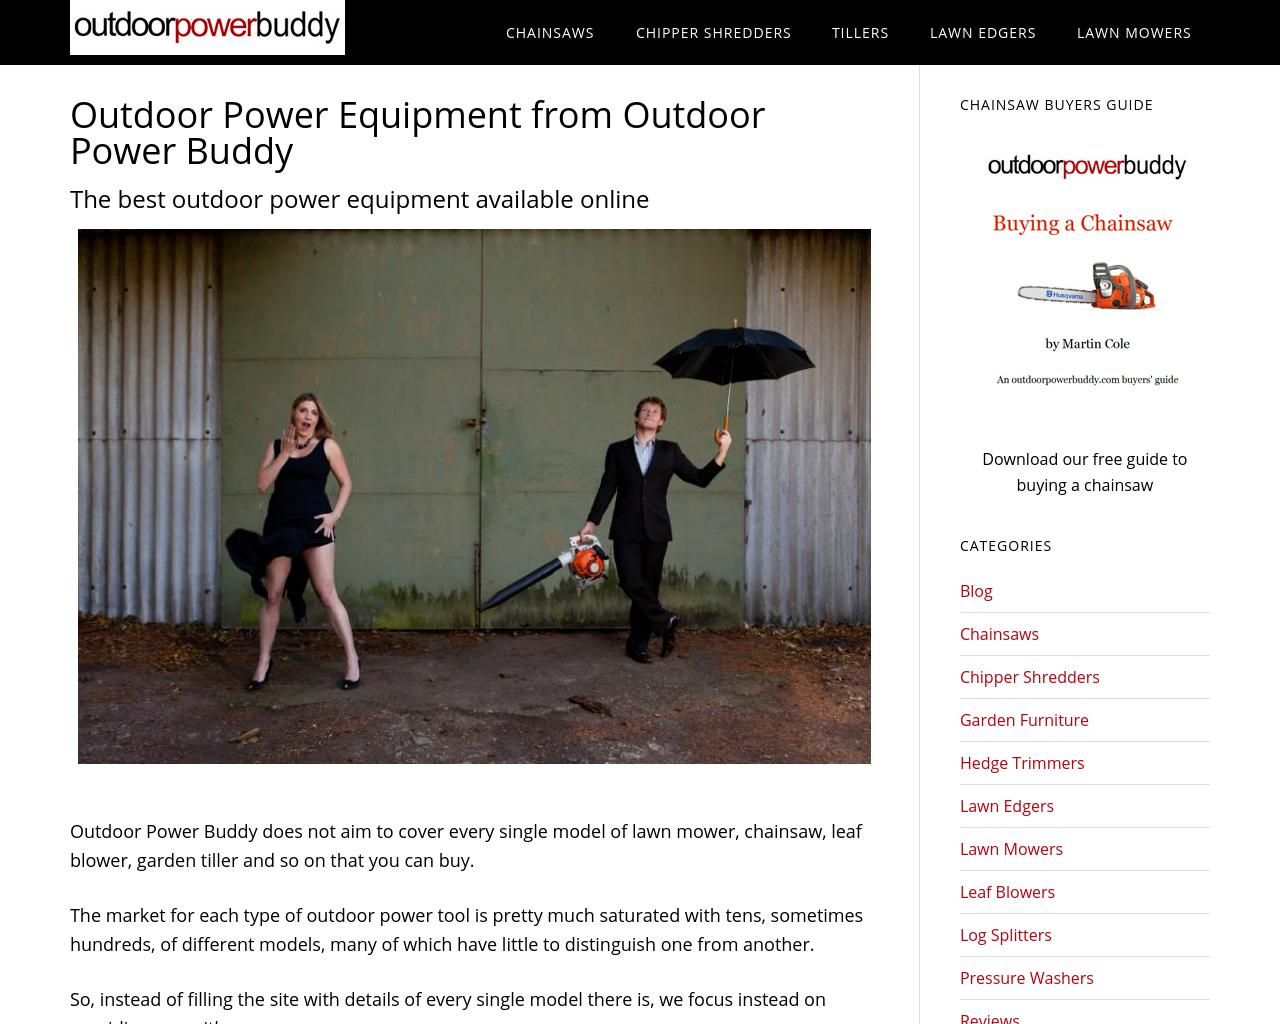 Outdoorpowerbuddy-Advertising-Reviews-Pricing